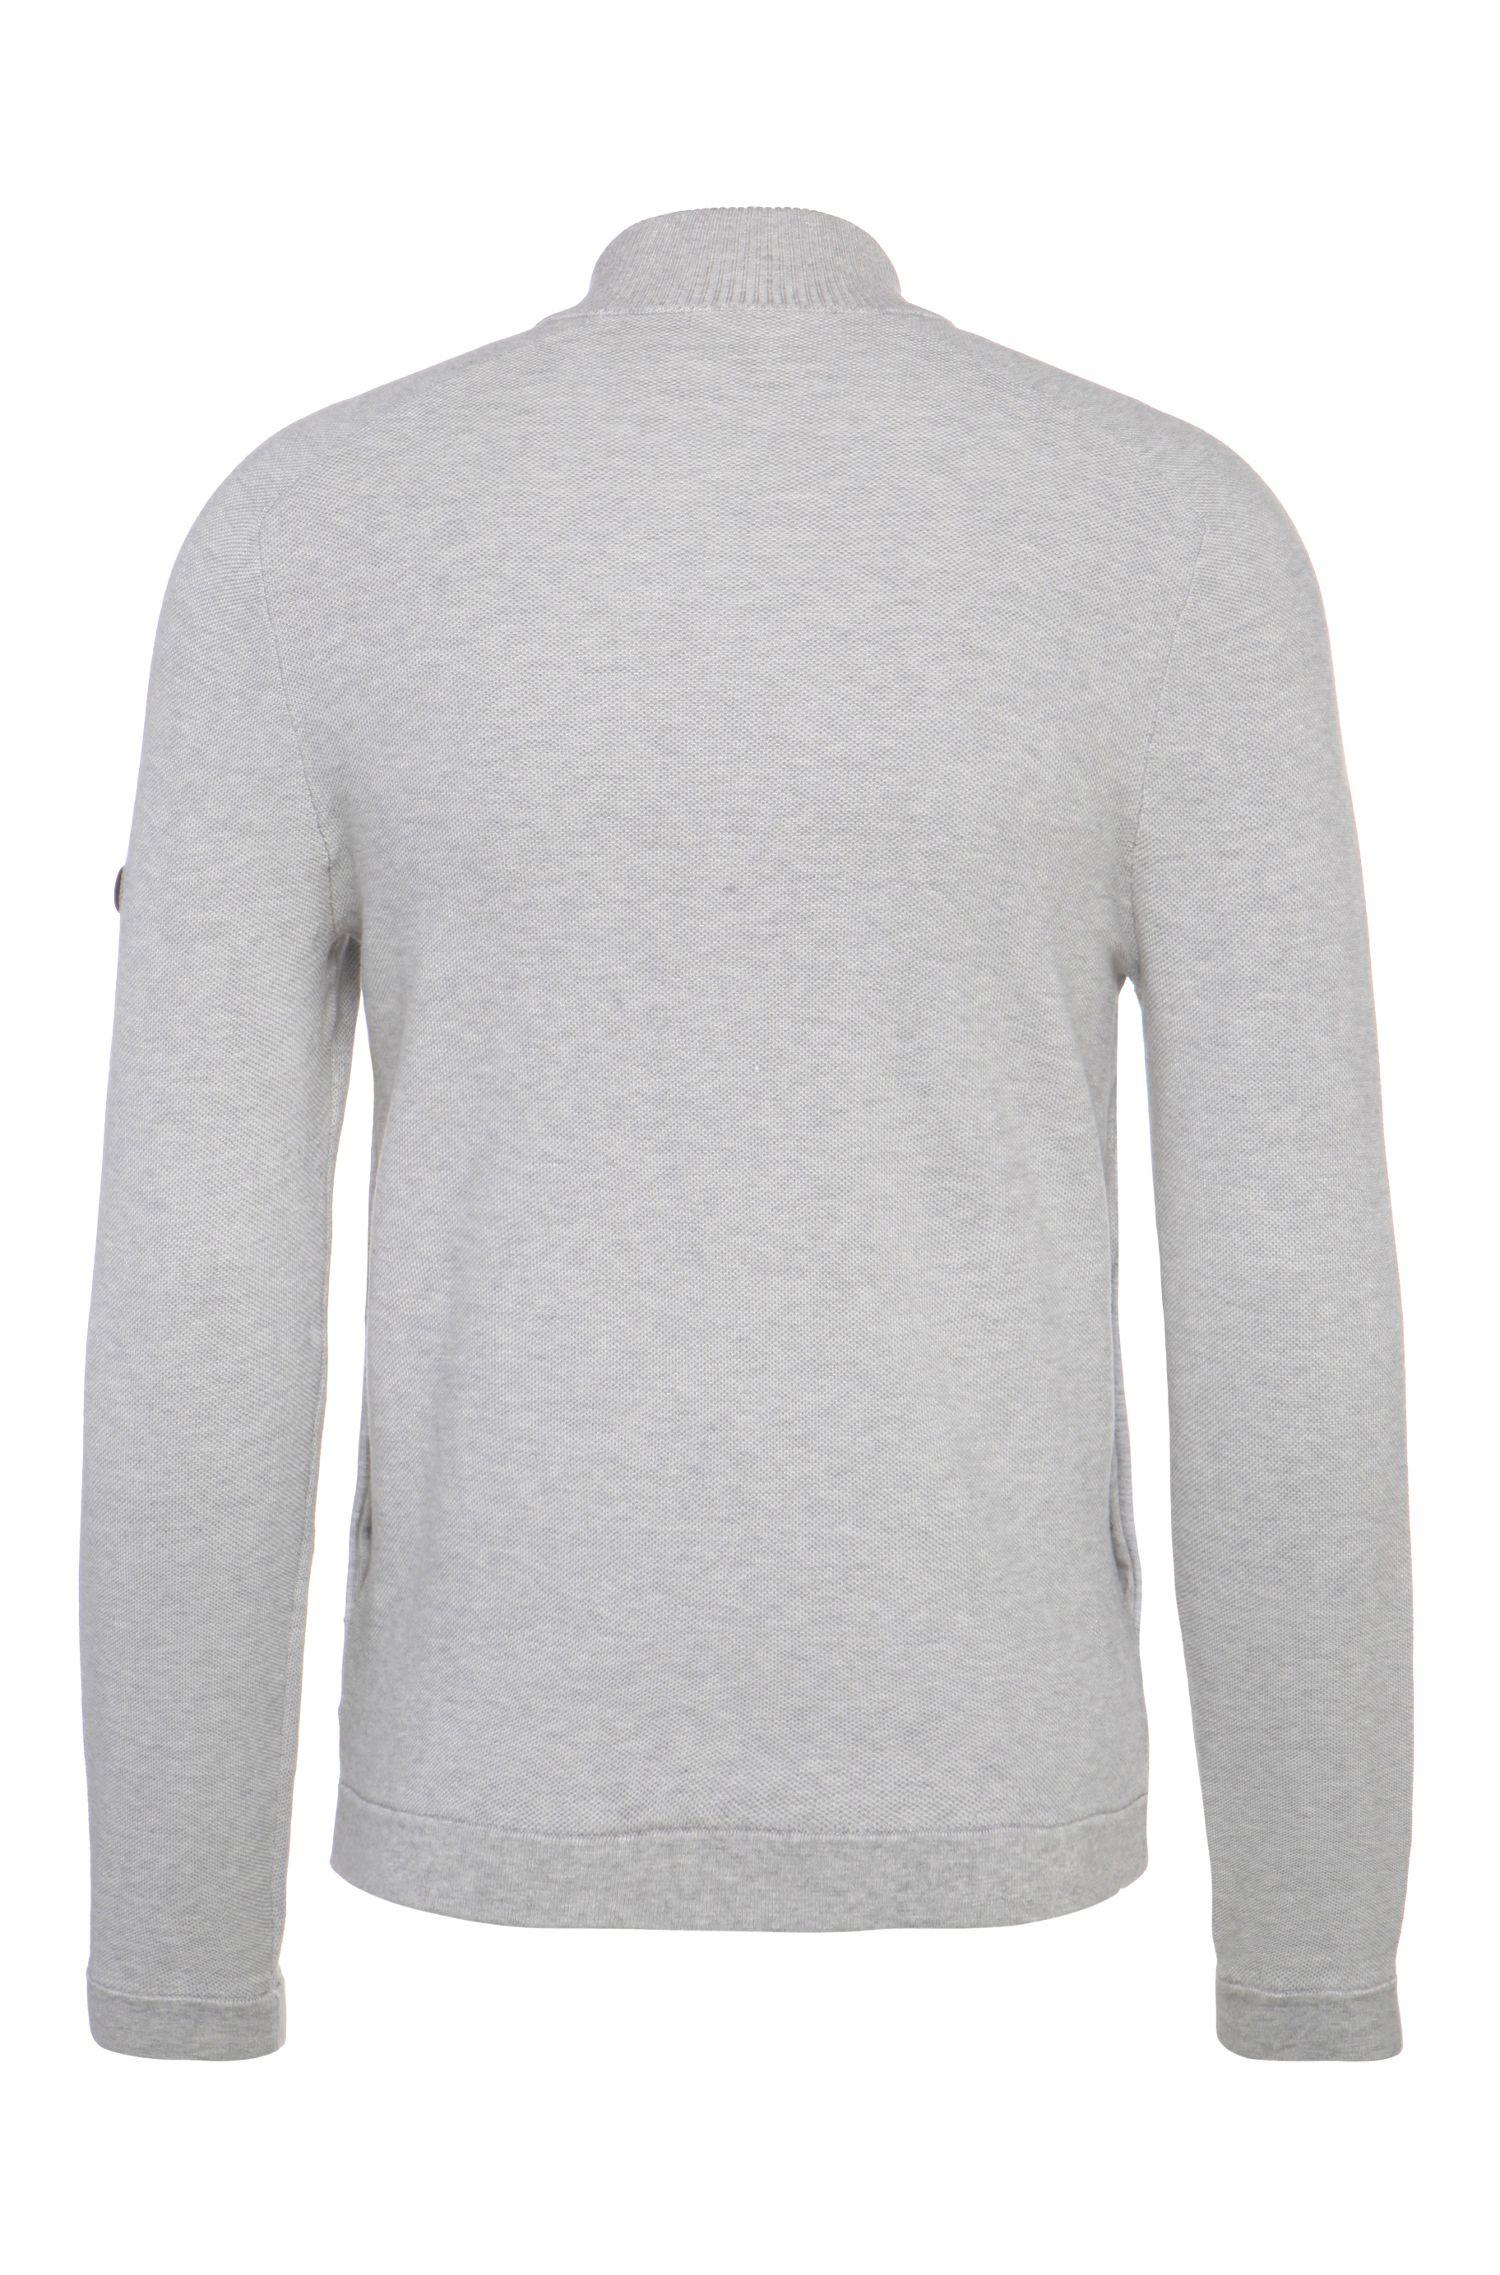 Regular-Fit Sweatshirt-Jacke aus Baumwoll-Mix: ´Byne`